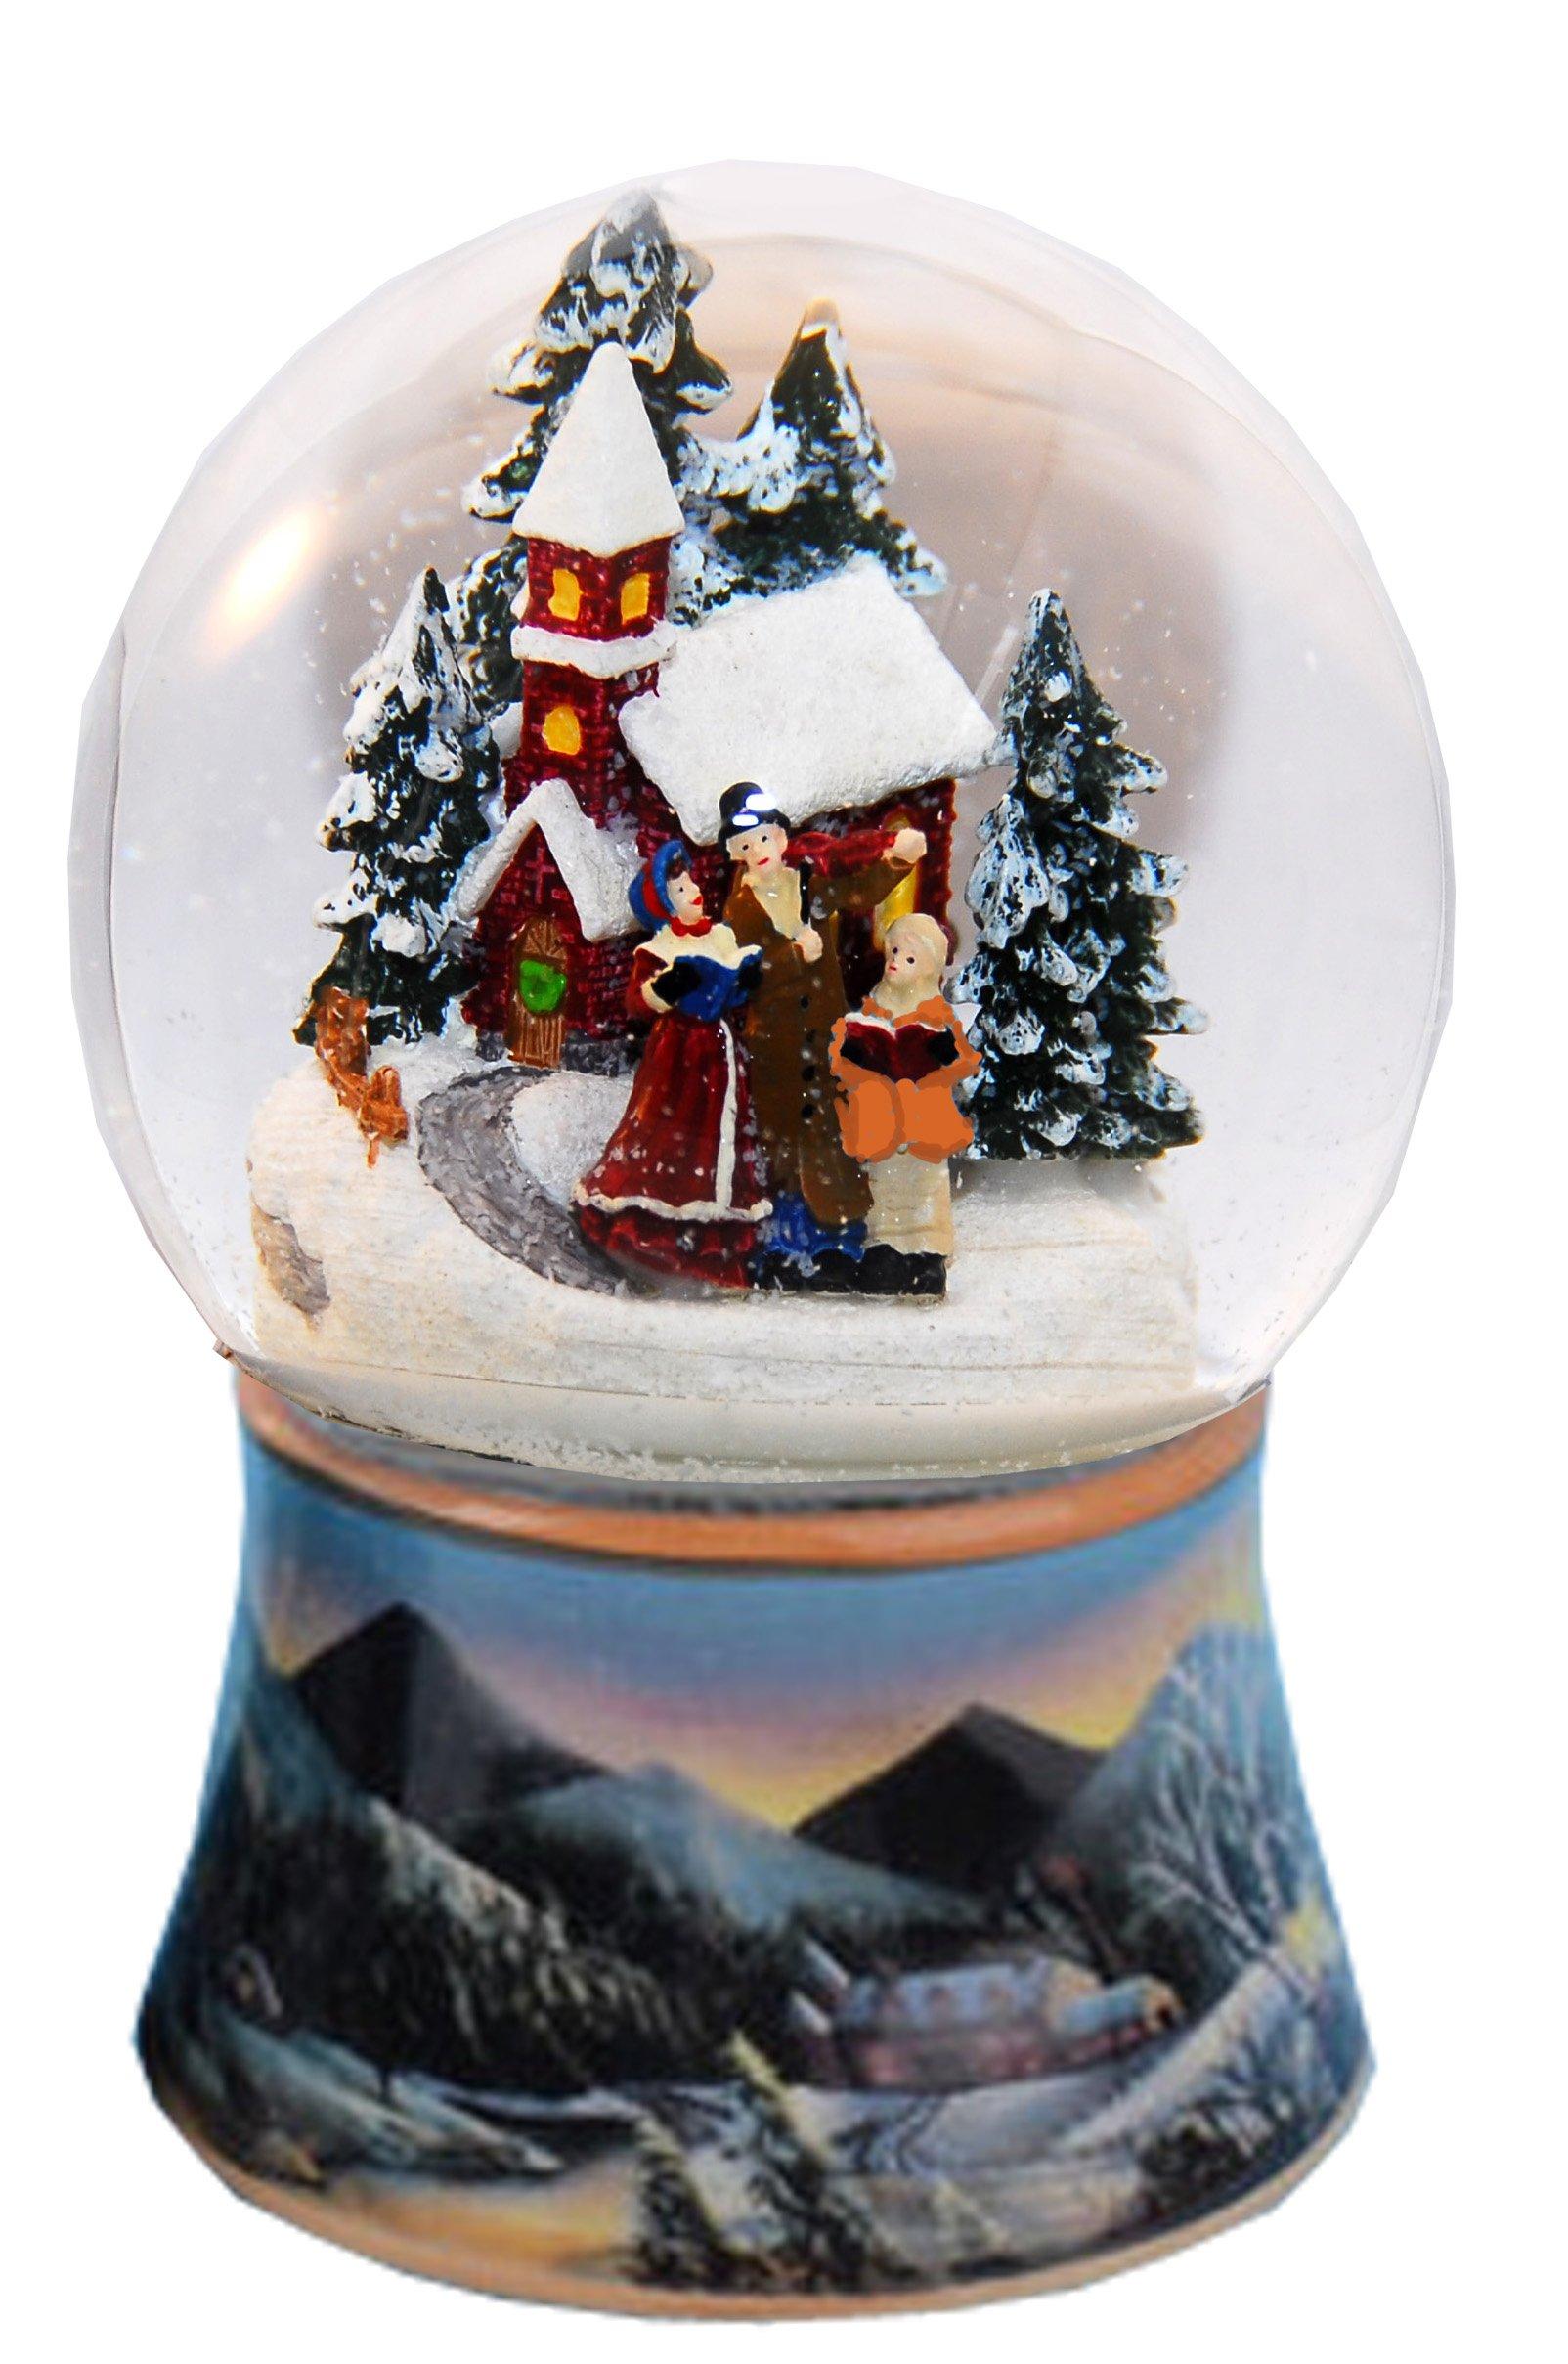 20083 Snow globe nostalgic winter walk rotation music box 5,5 inch height